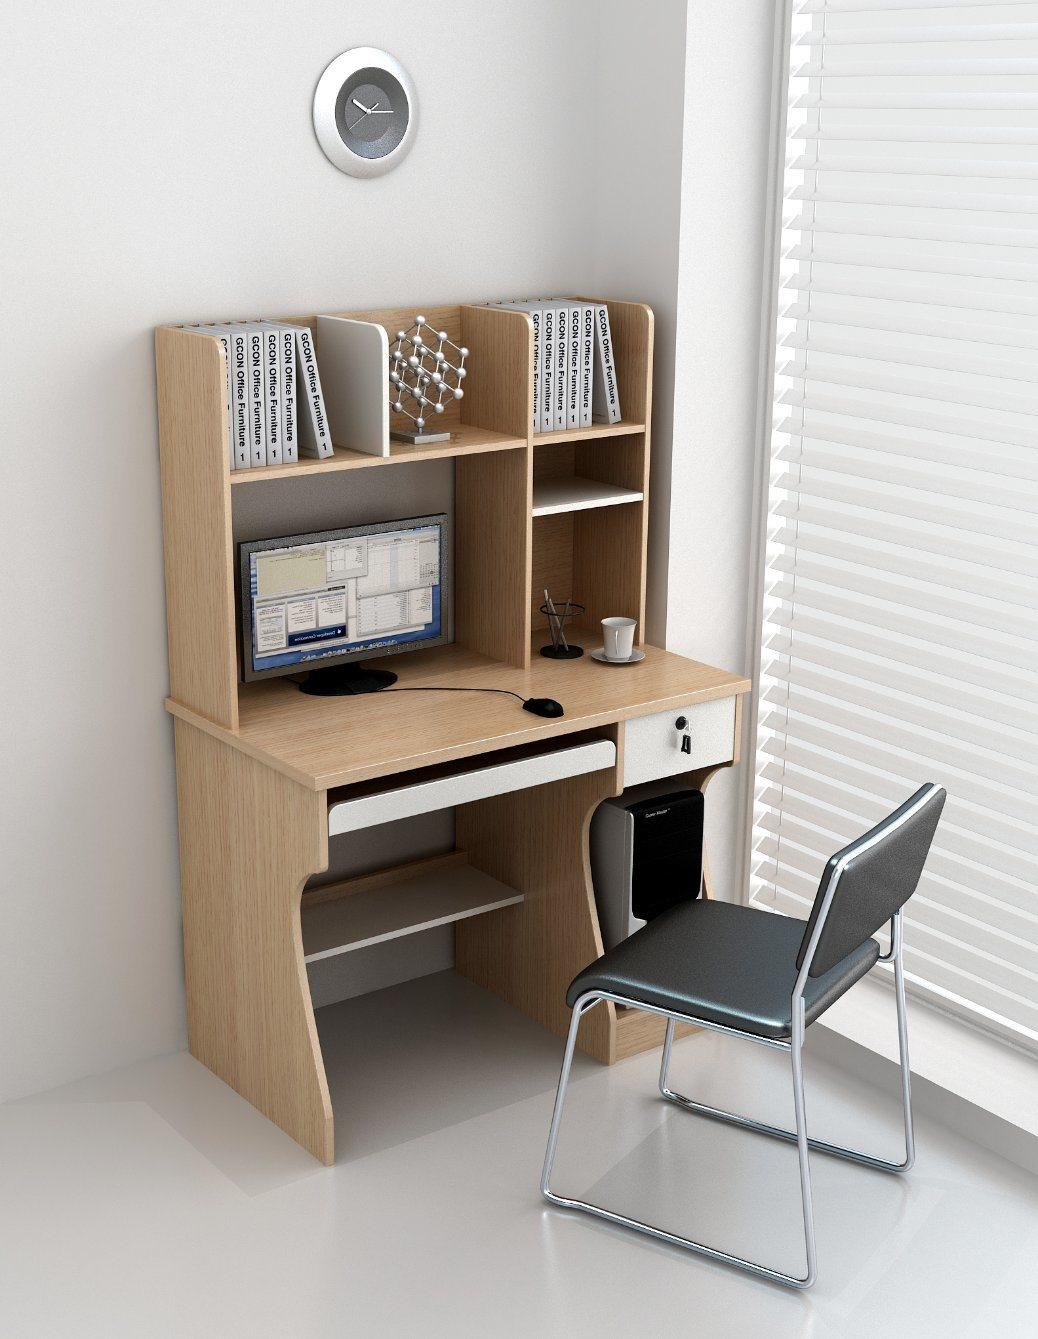 China Home Furniture Modern Computer Desk For Children With Bookshelf Wooden